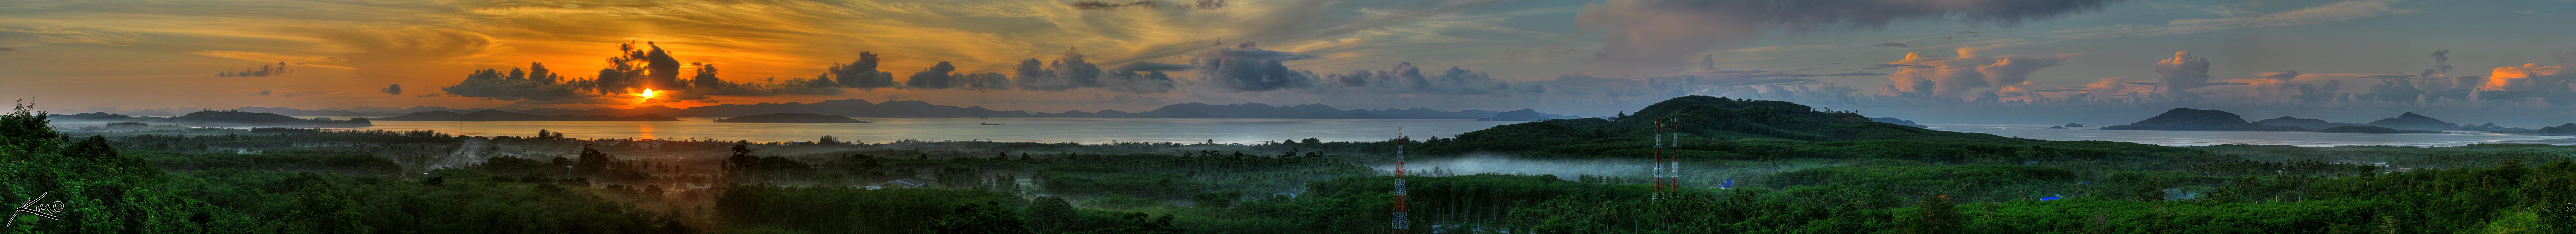 Hdr panorama phuket thailand sunrise